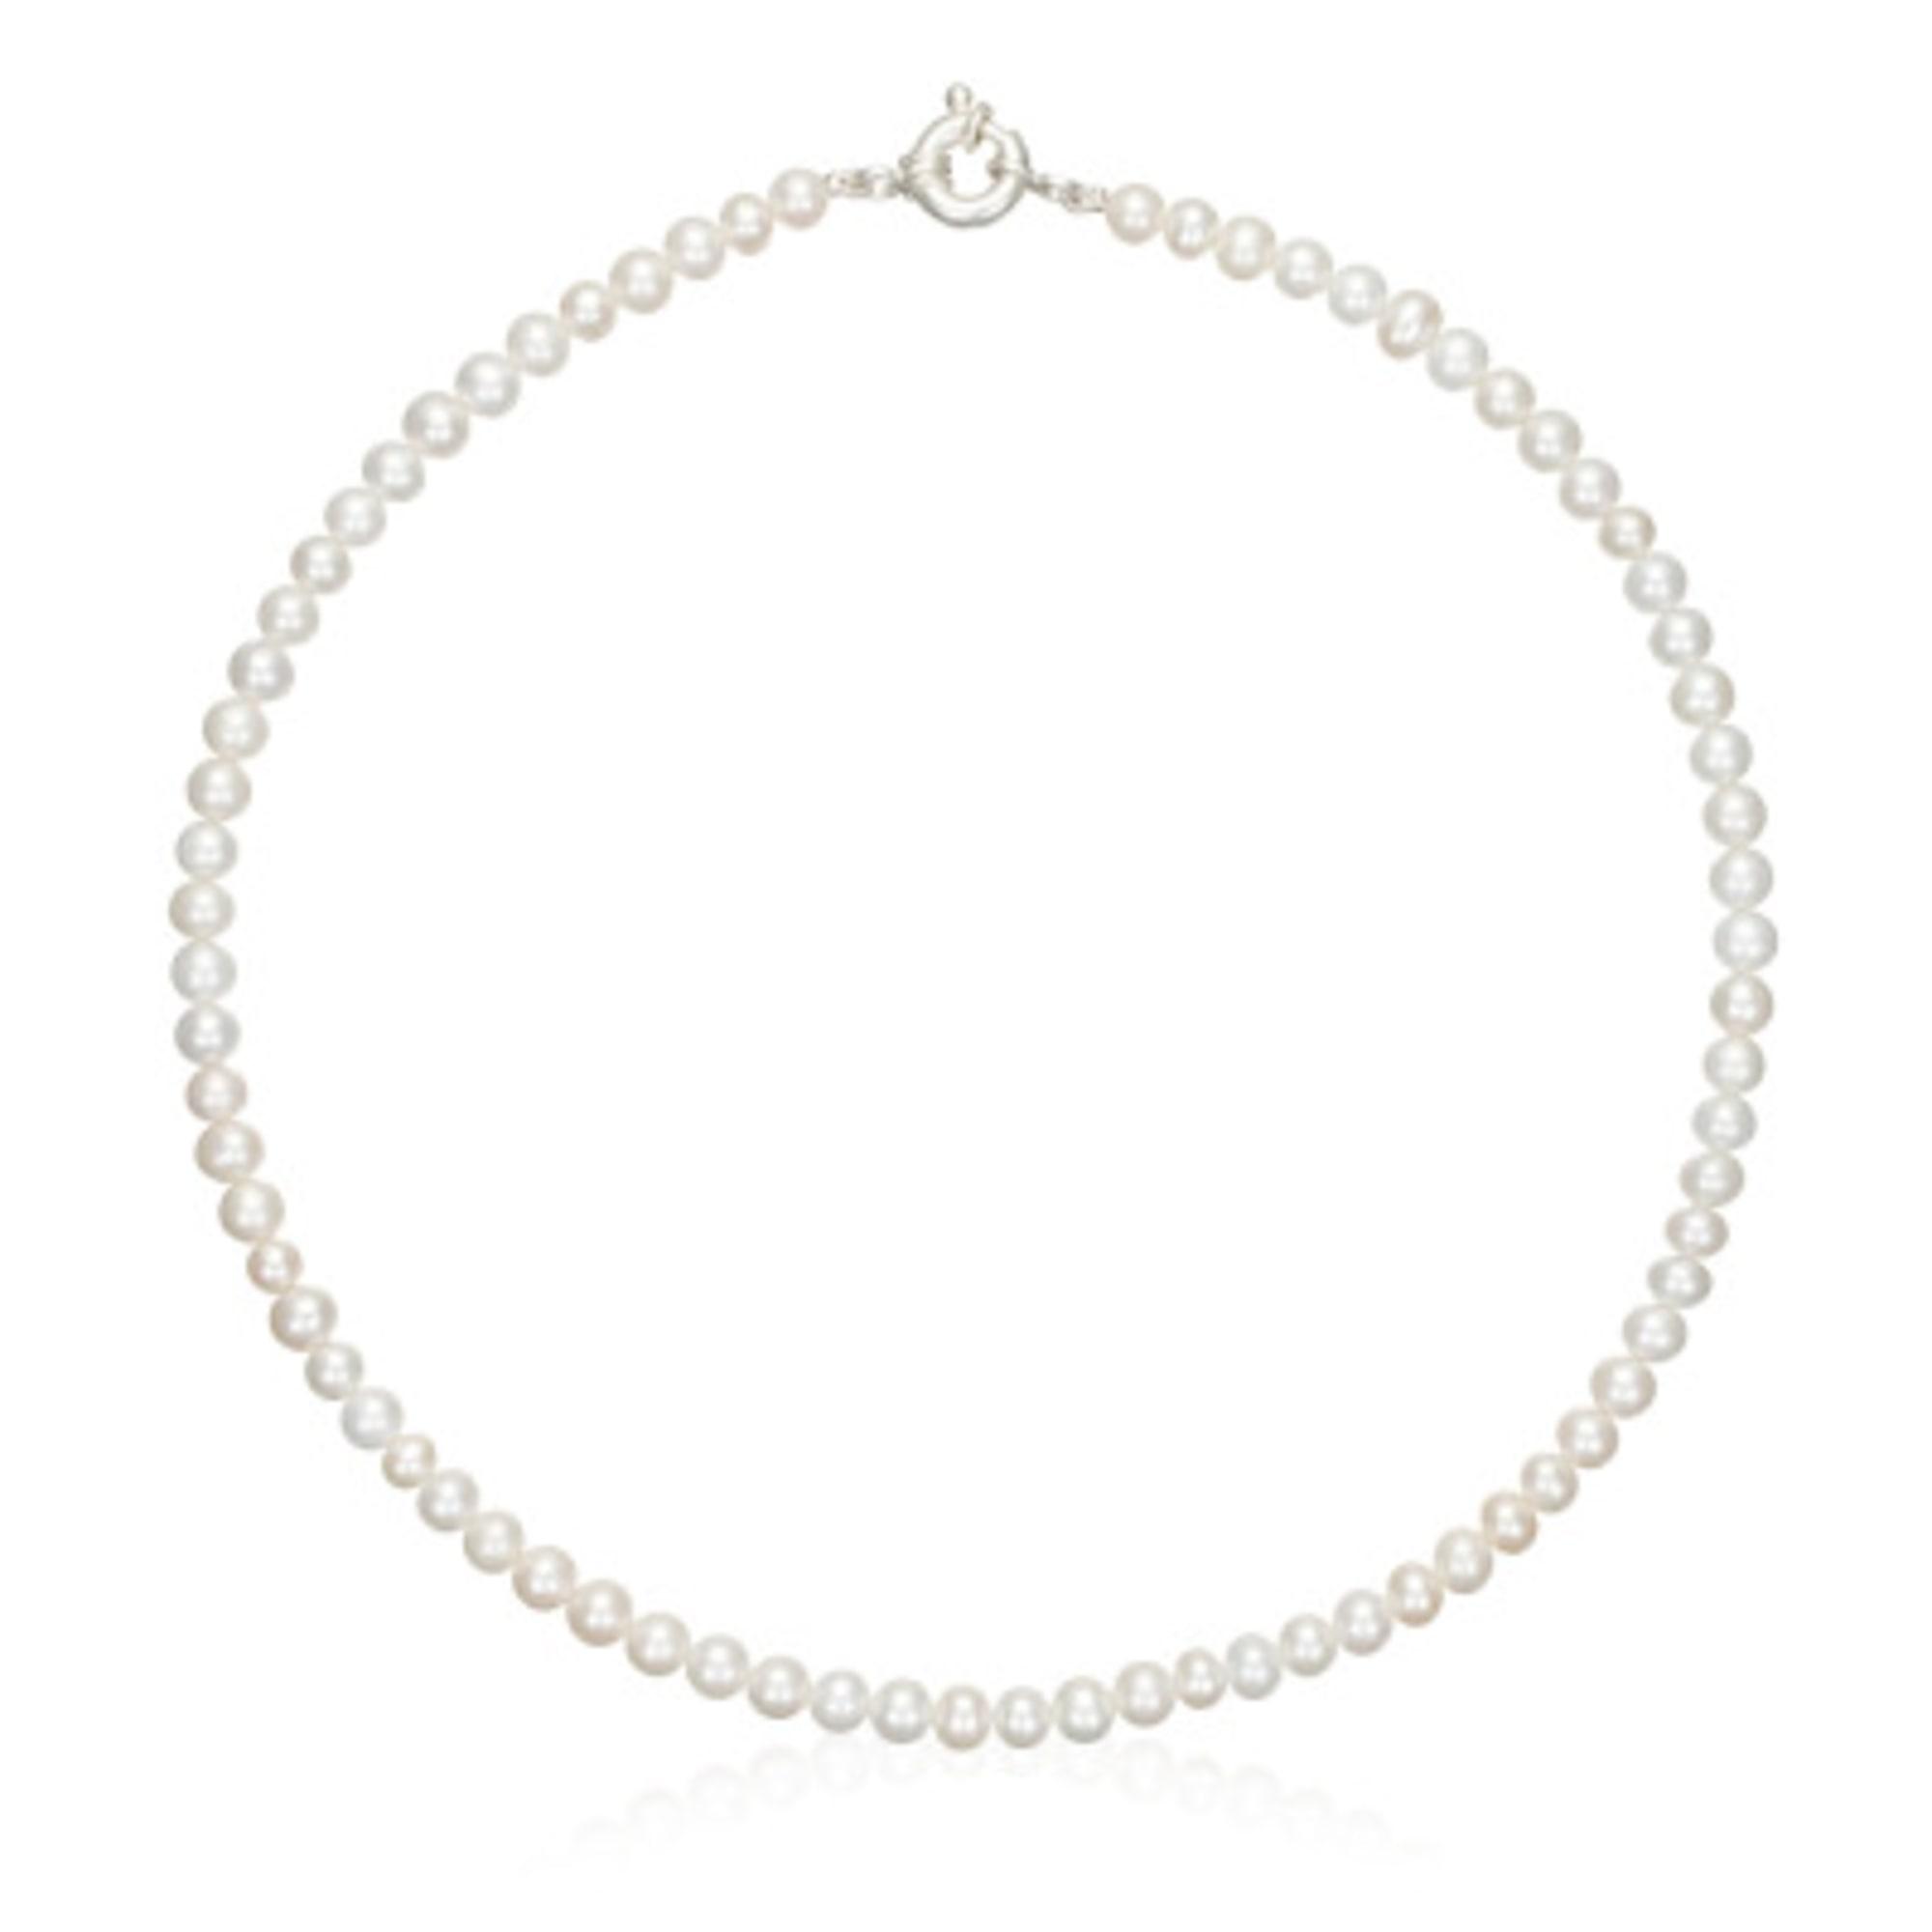 collier perle atelier saint germain